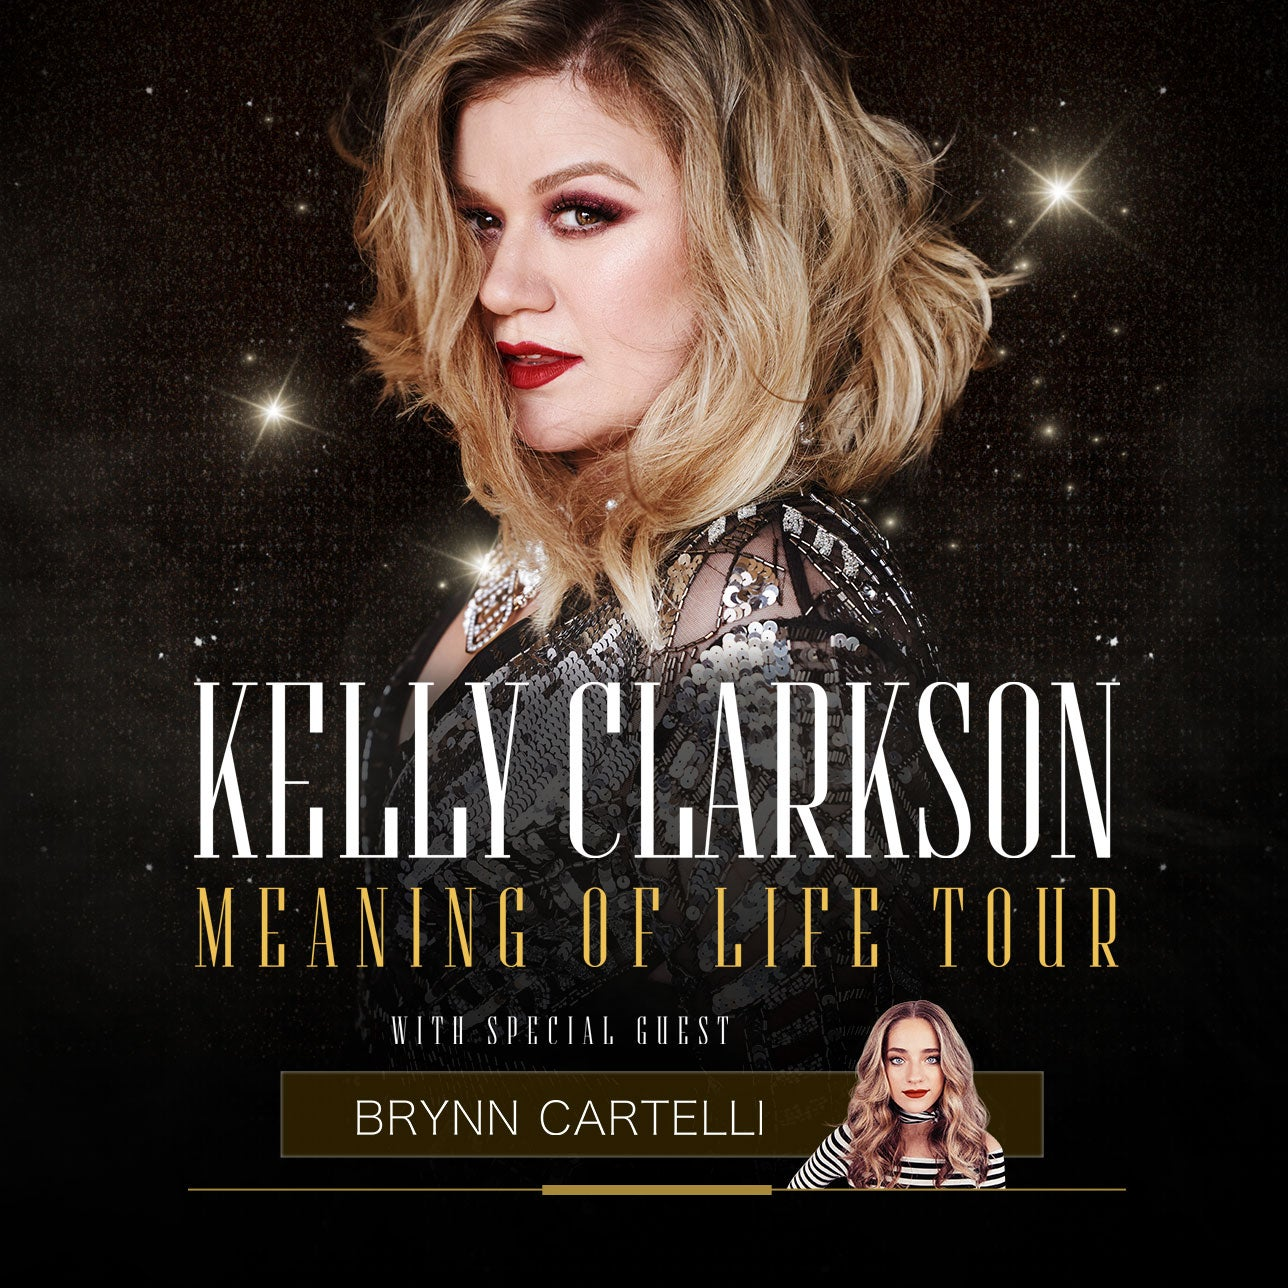 Kelly Clarkson Coming to Xcel Energy Center Feb. 16 | Xcel Energy Center